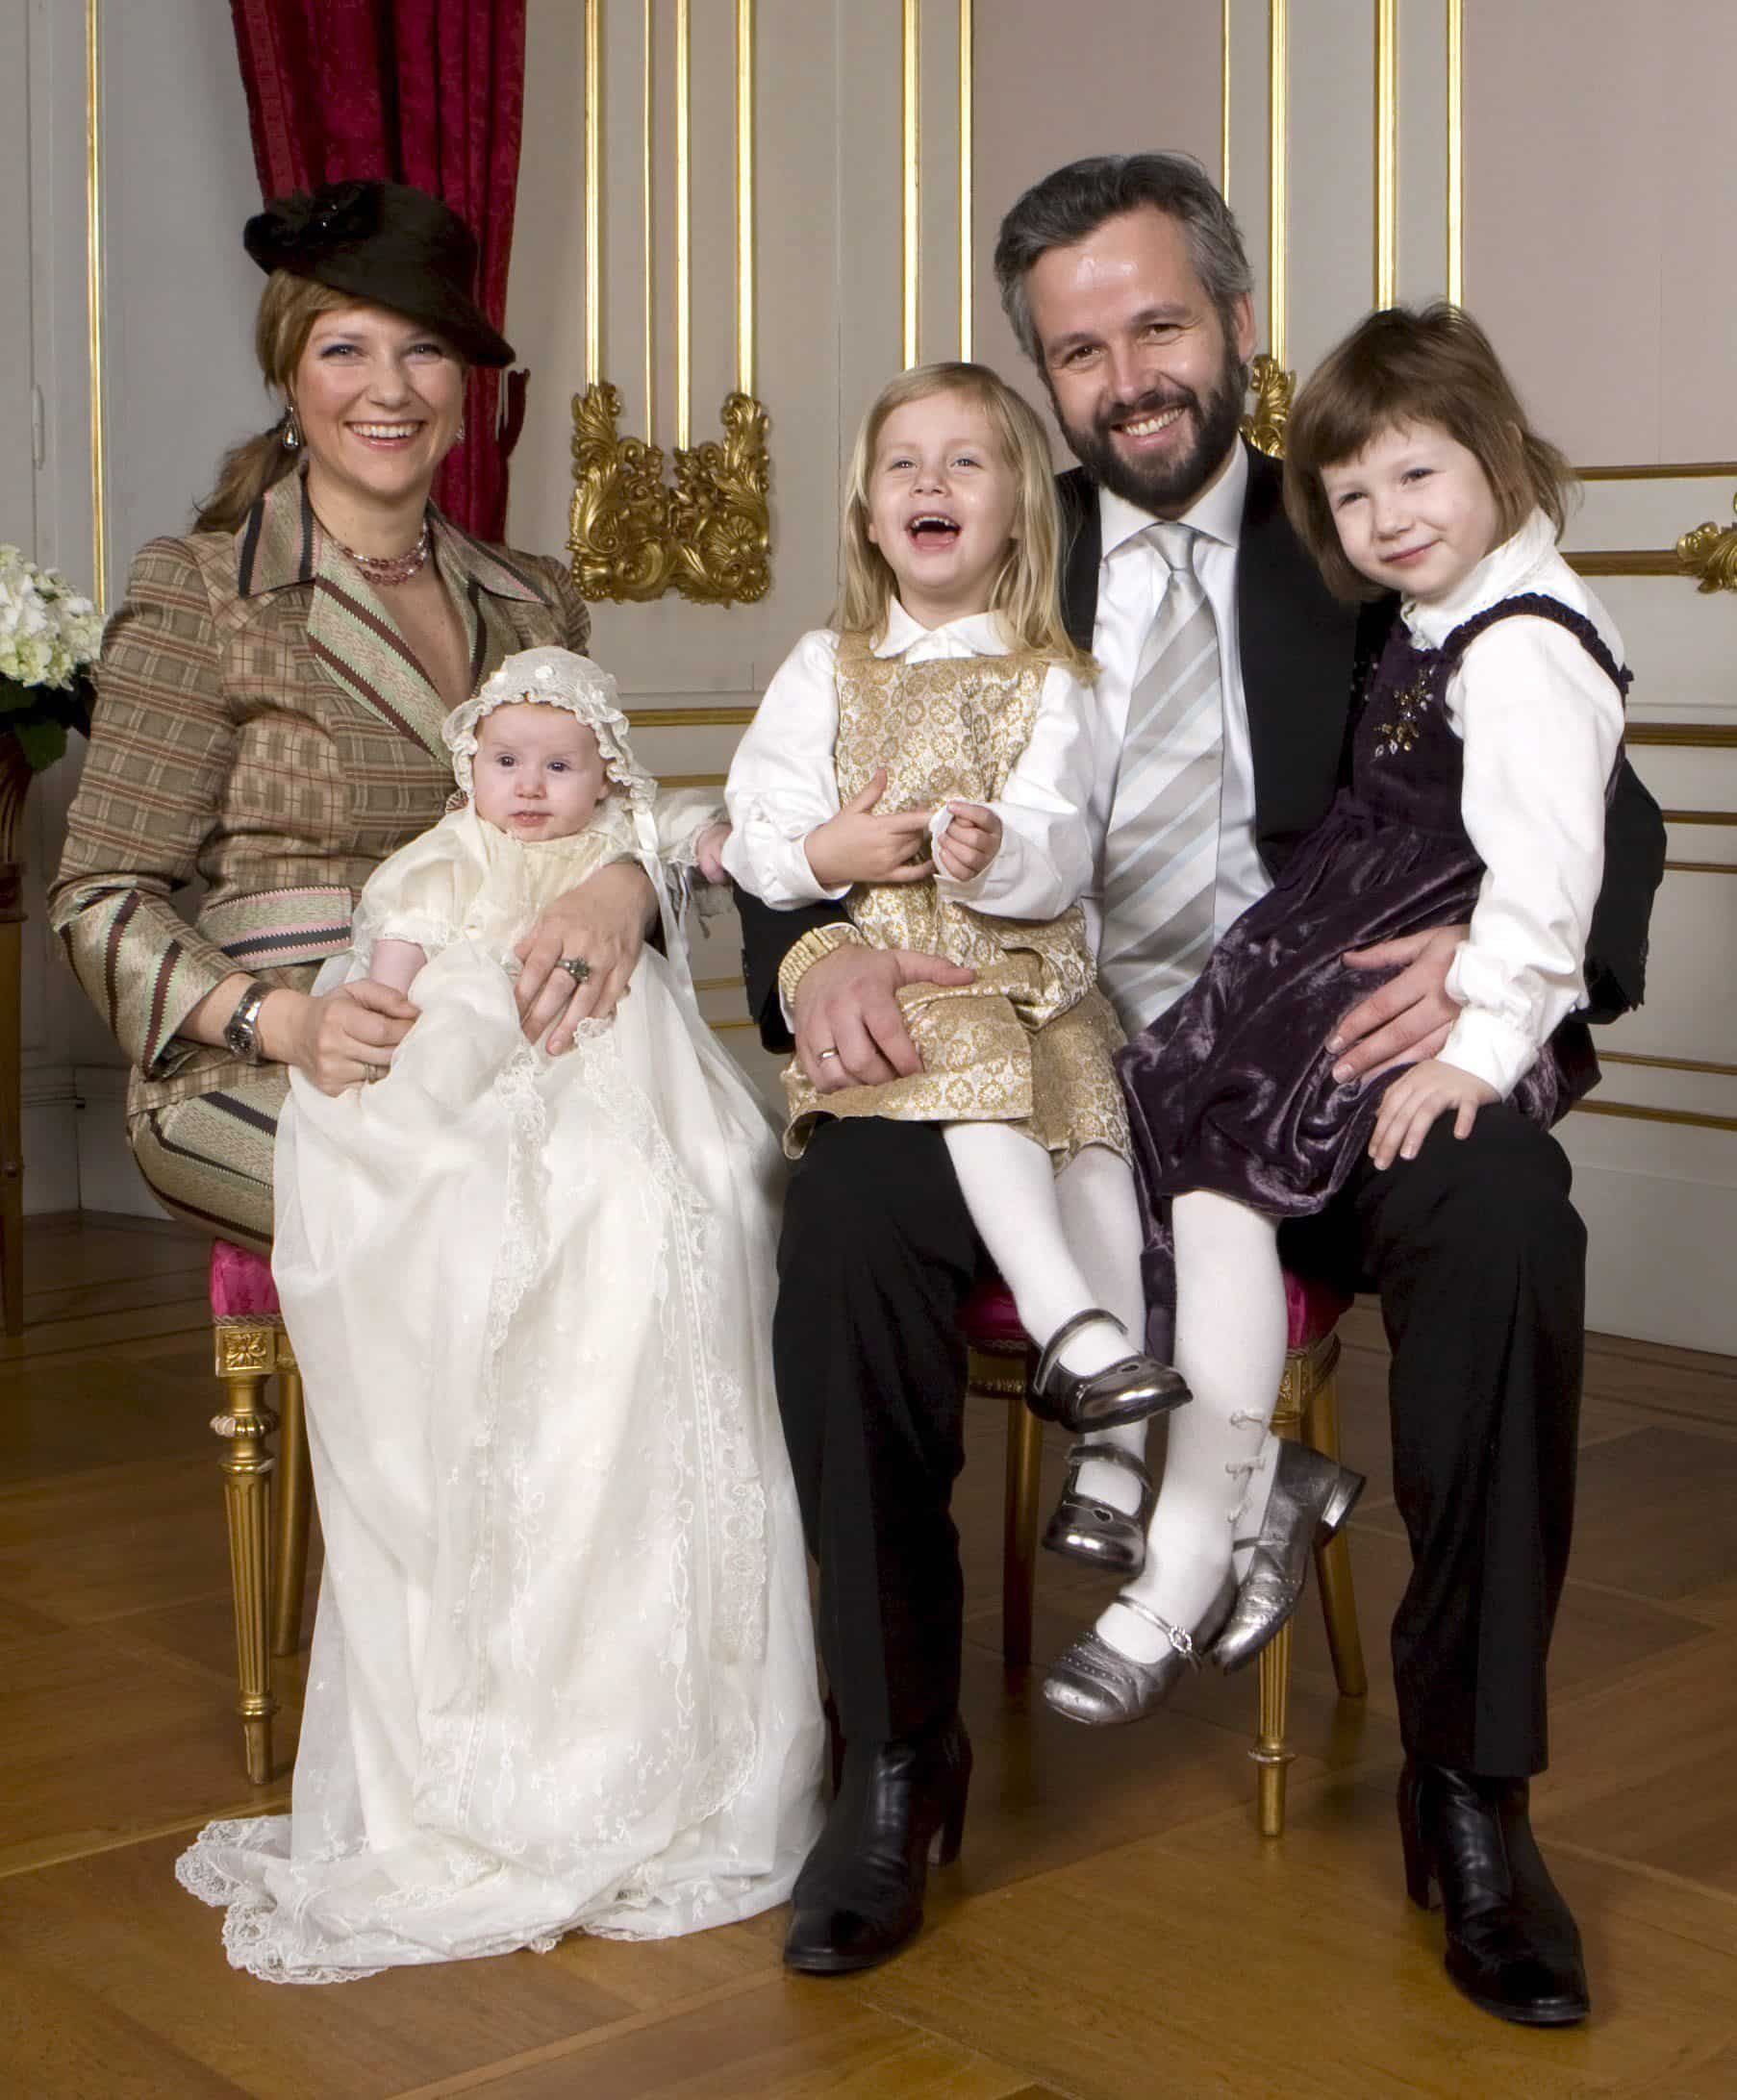 Taufe von Emma Tallulah Behn: Das Familienglück wirkt perfekt.